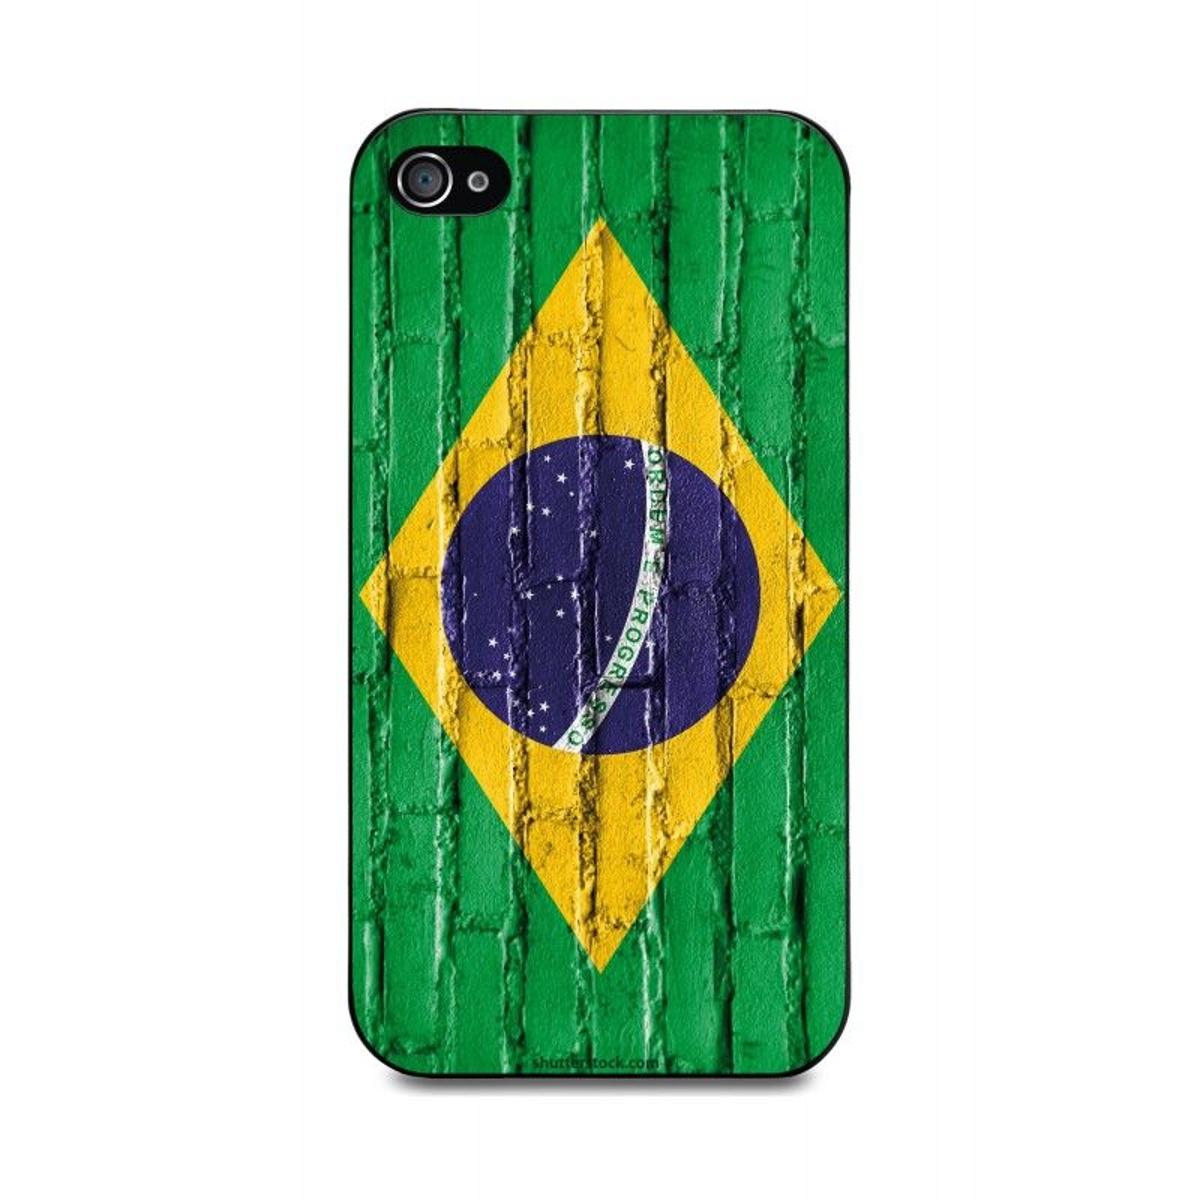 Muvit Coque Noire Bresil Mur Apple Iphone 4S